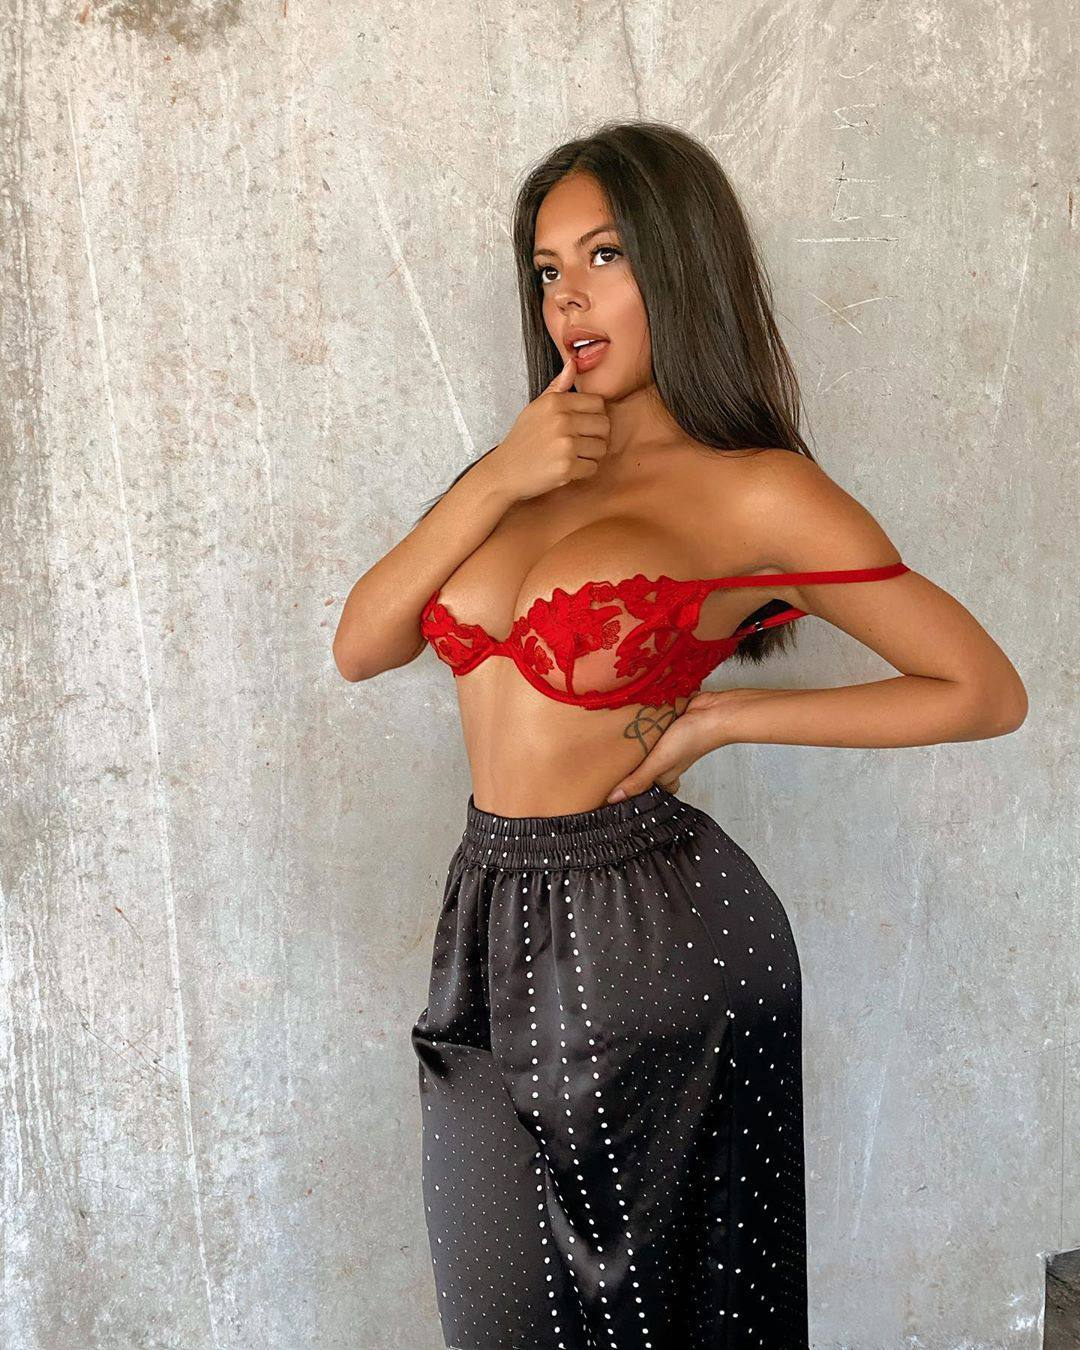 Nicole Borda – Sexy Big Boobs In Red Bra Photoshoot 0003